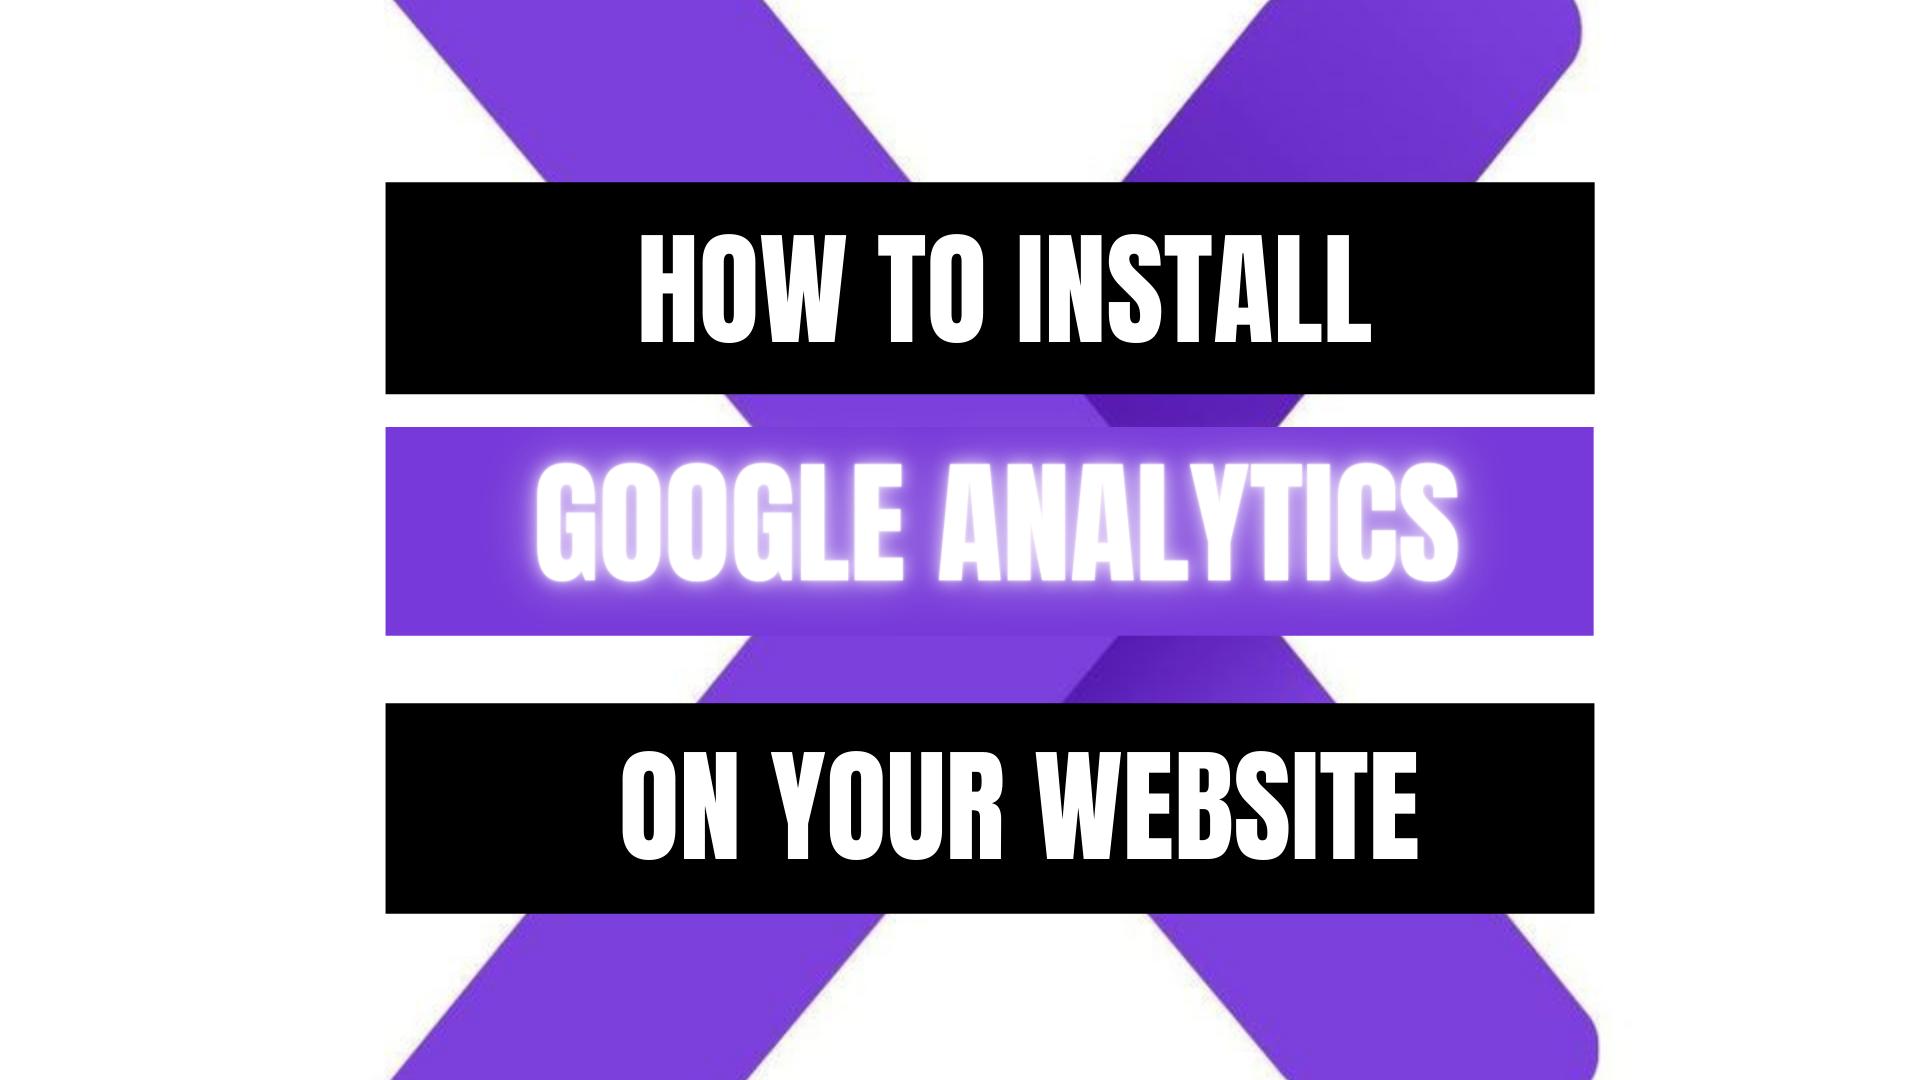 Peekaboox - How to Install Google Analytics on Your Site